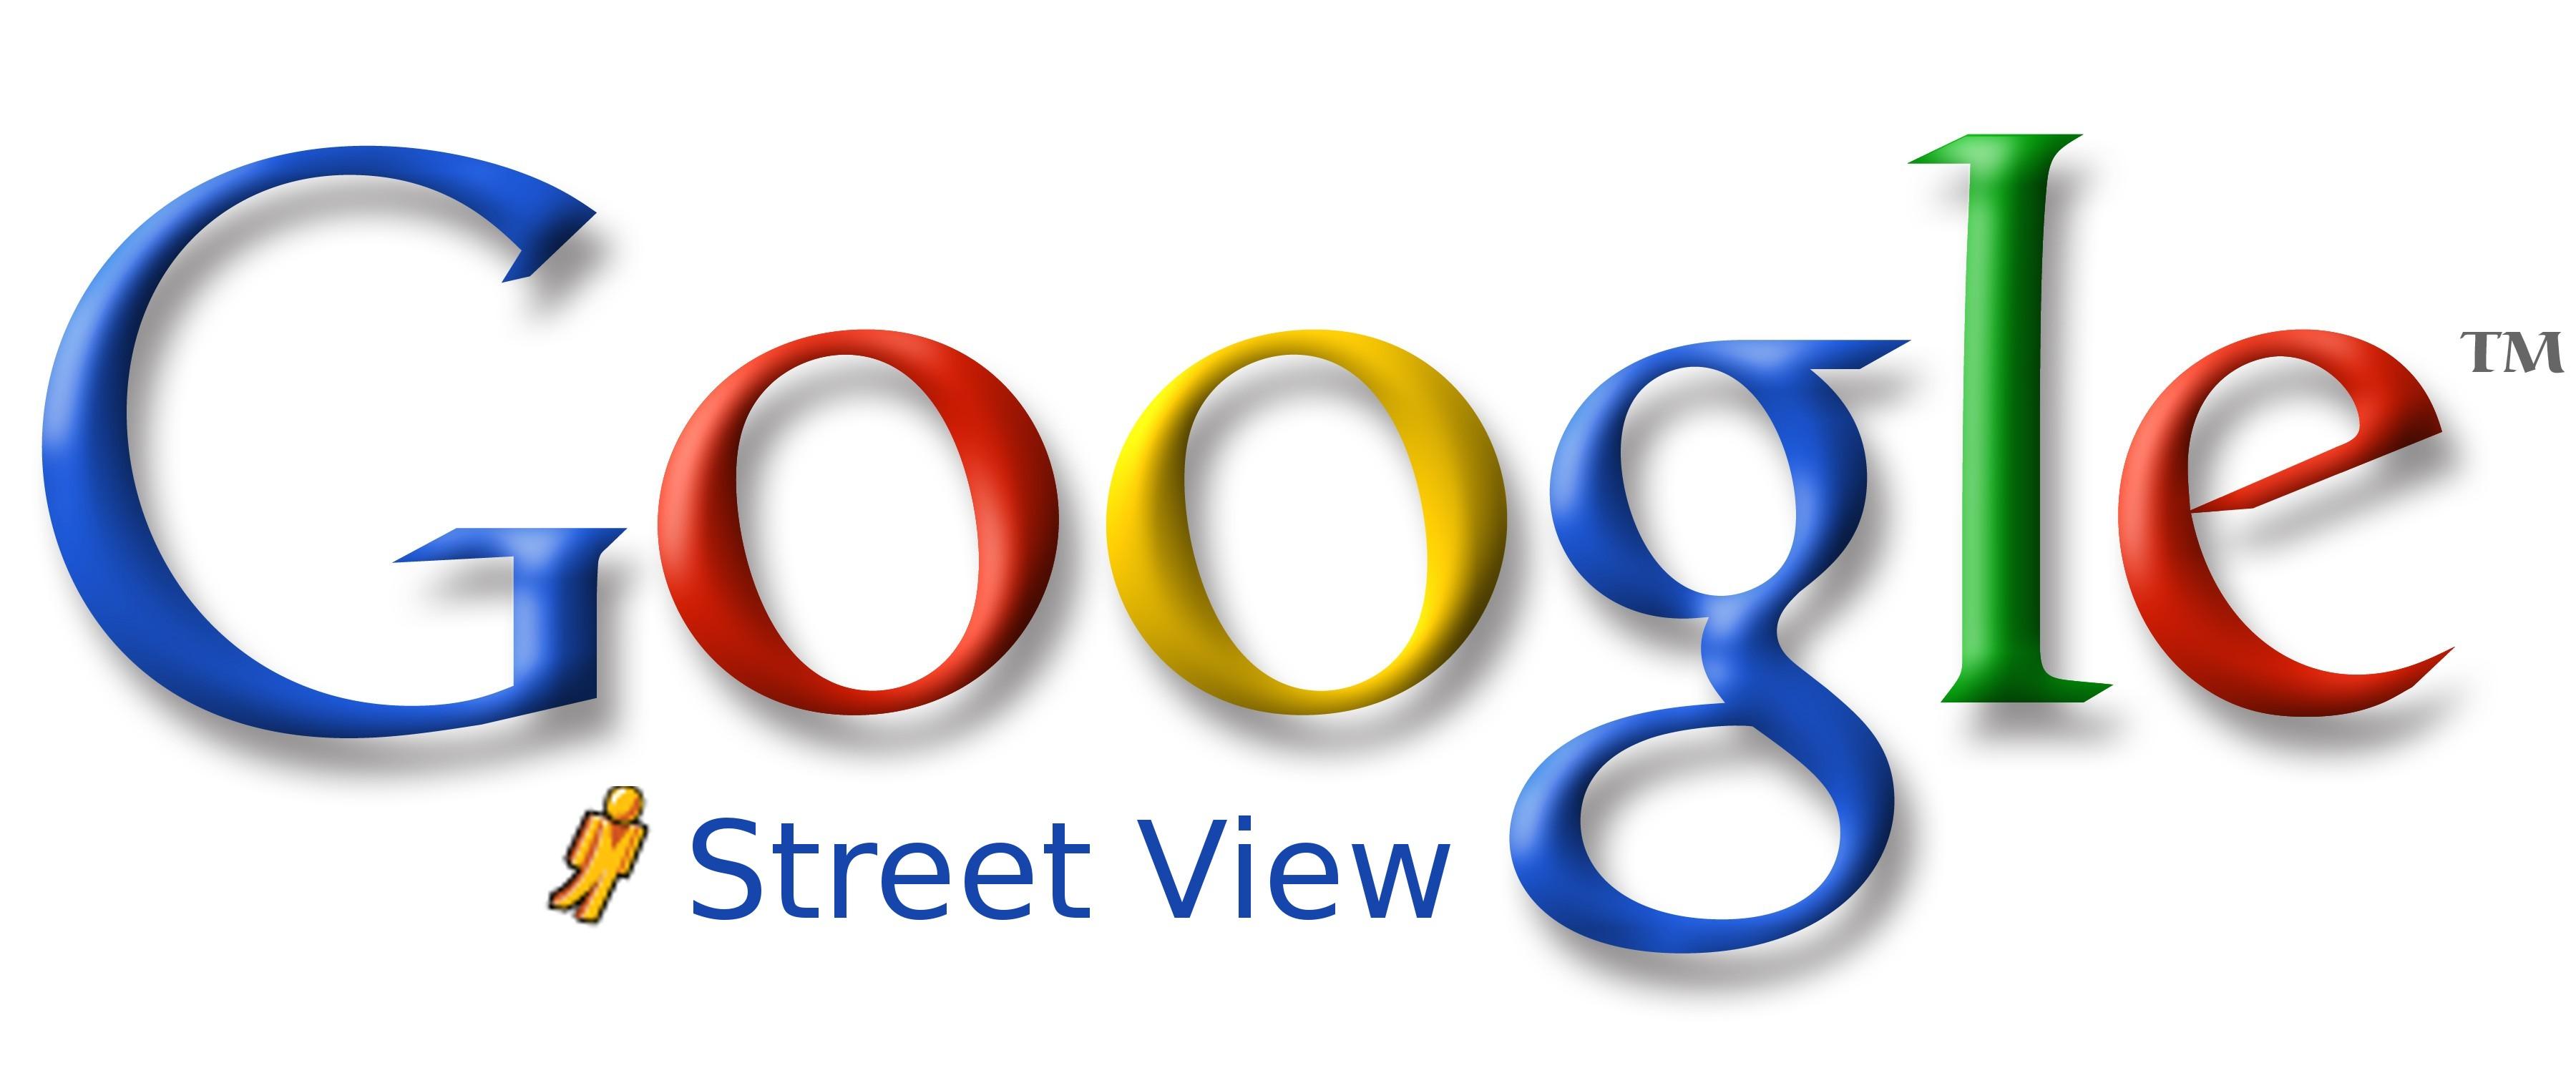 Imágenes Graciosas de Google Street view. [Megapost]